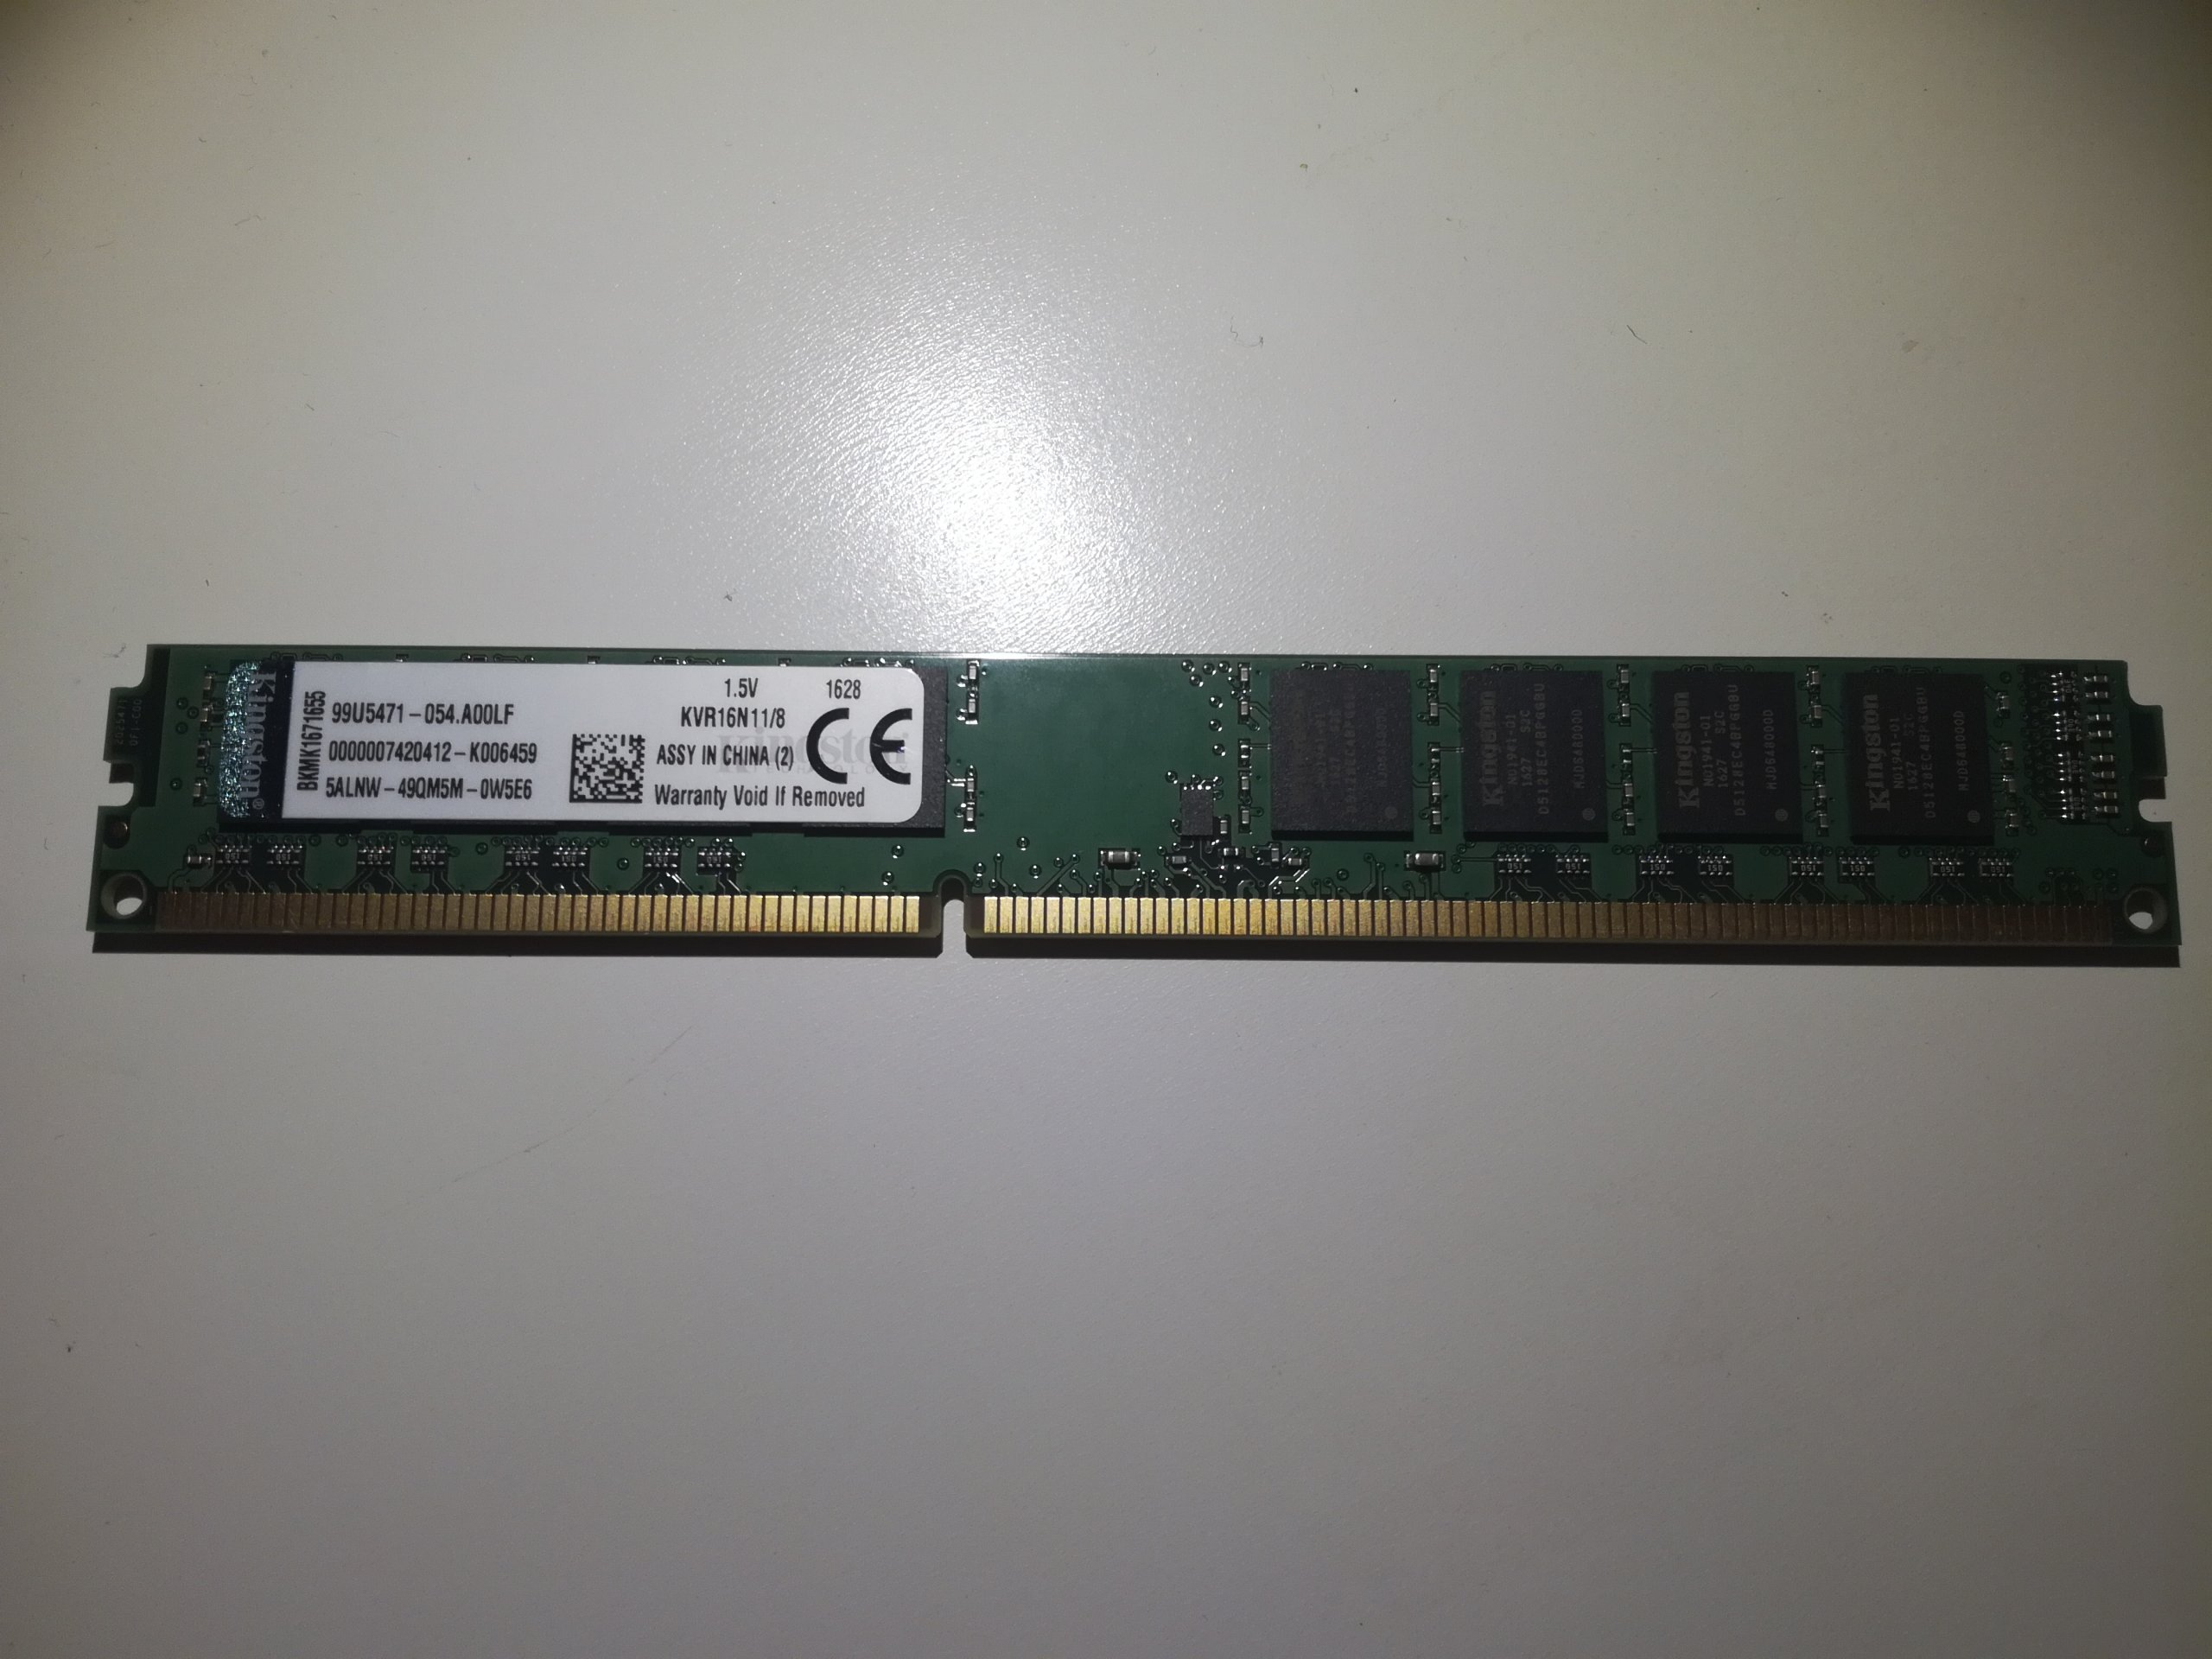 Pamięć RAM Kingston DDR3 8192MB 1600 8 GB od 1zl